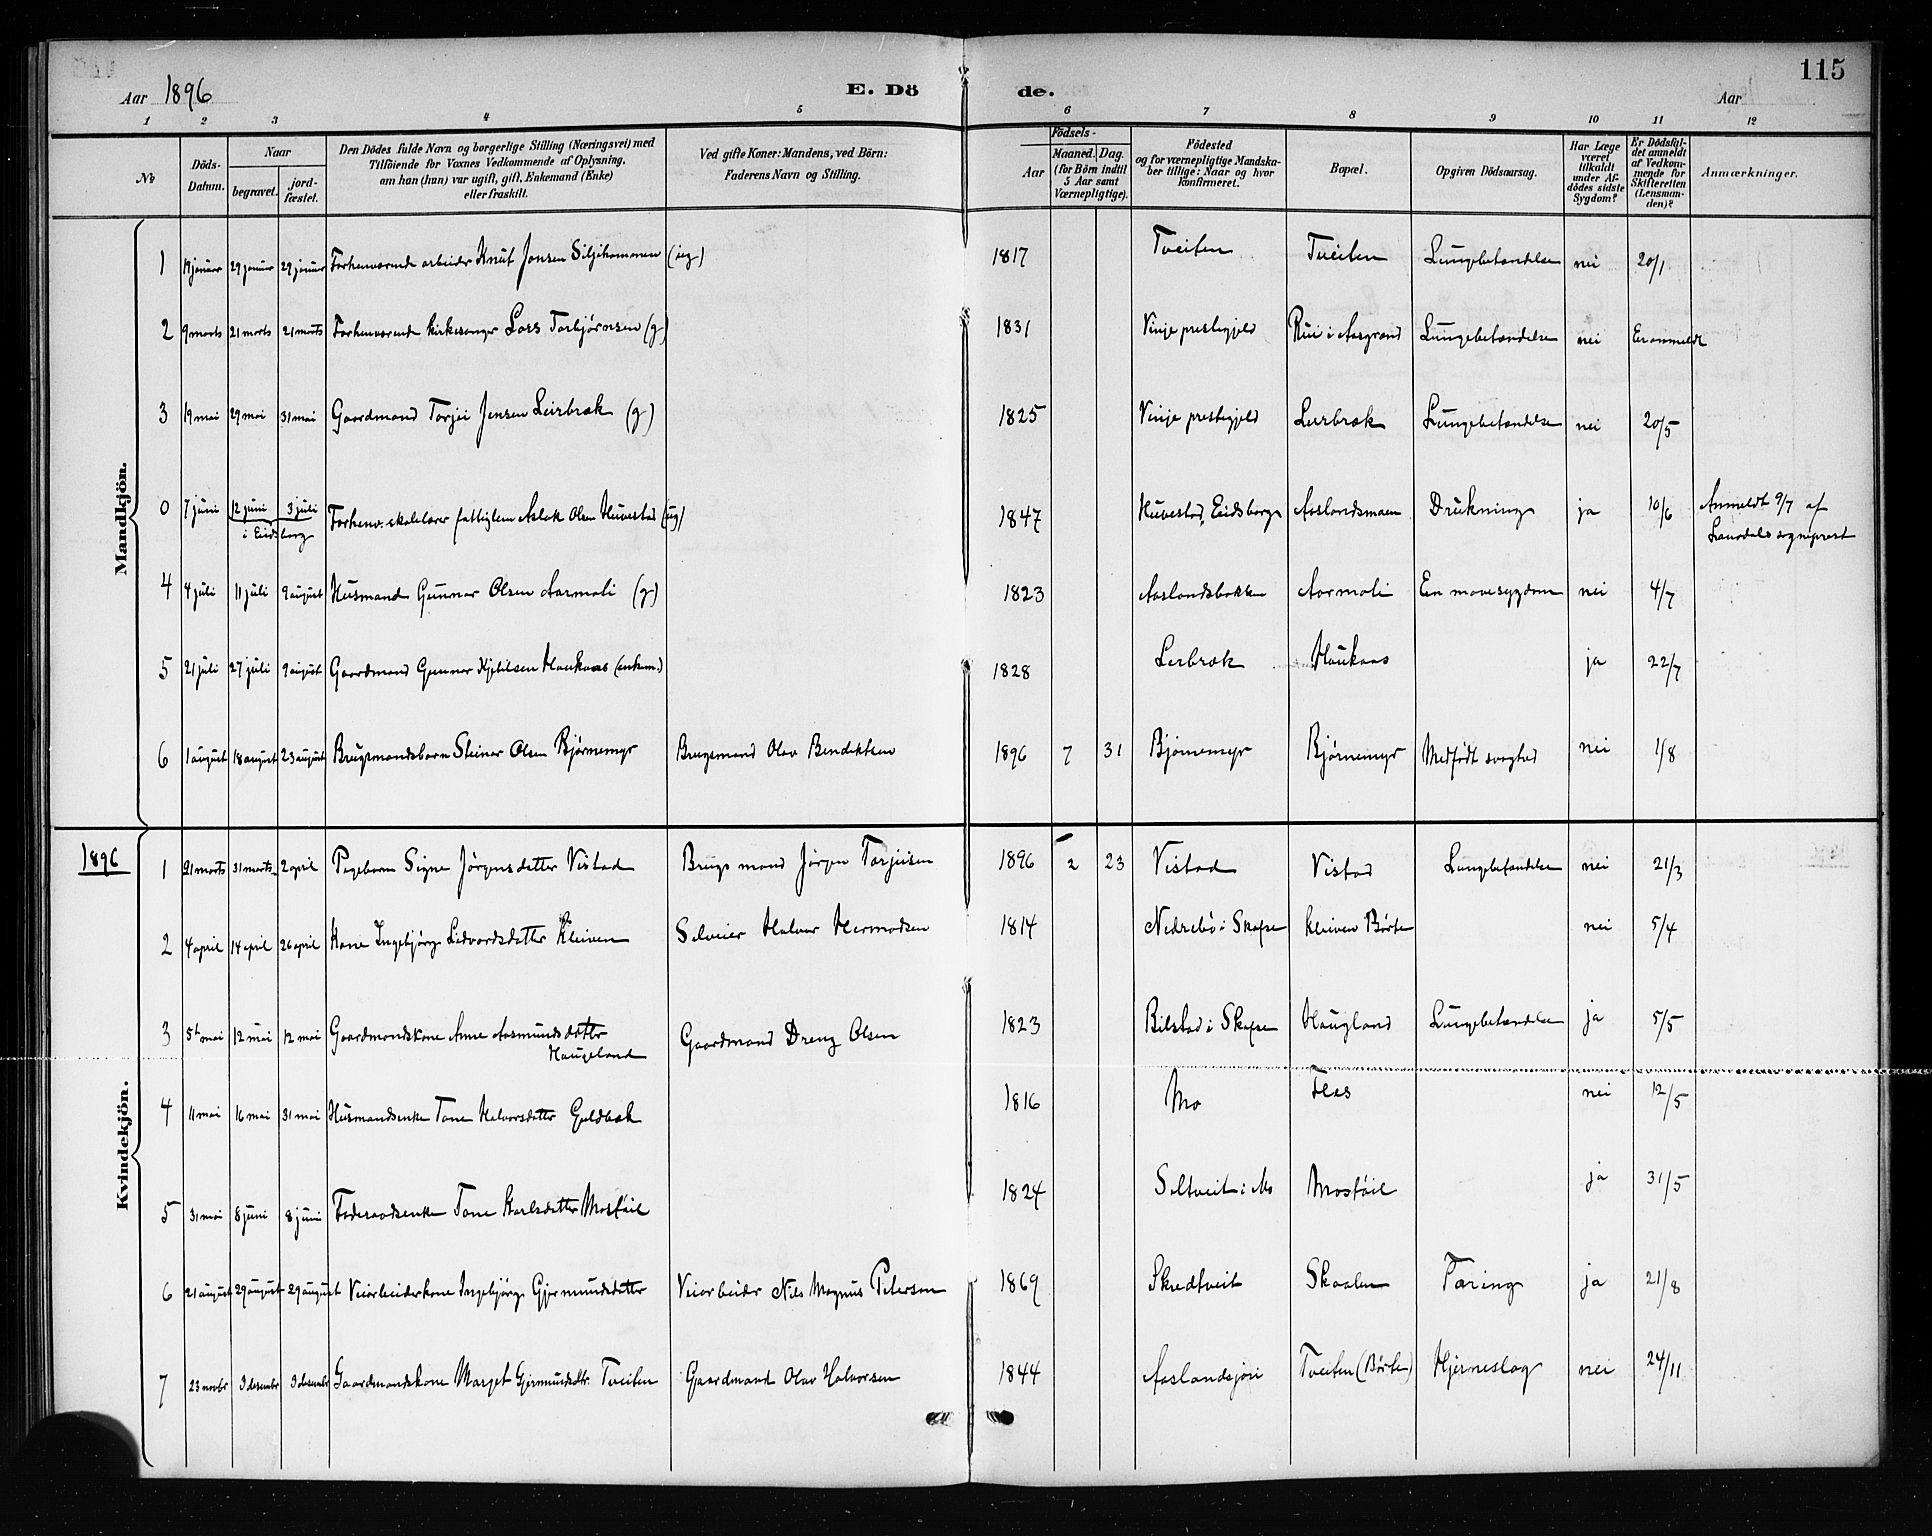 SAKO, Mo kirkebøker, G/Ga/L0002: Klokkerbok nr. I 2, 1892-1914, s. 115